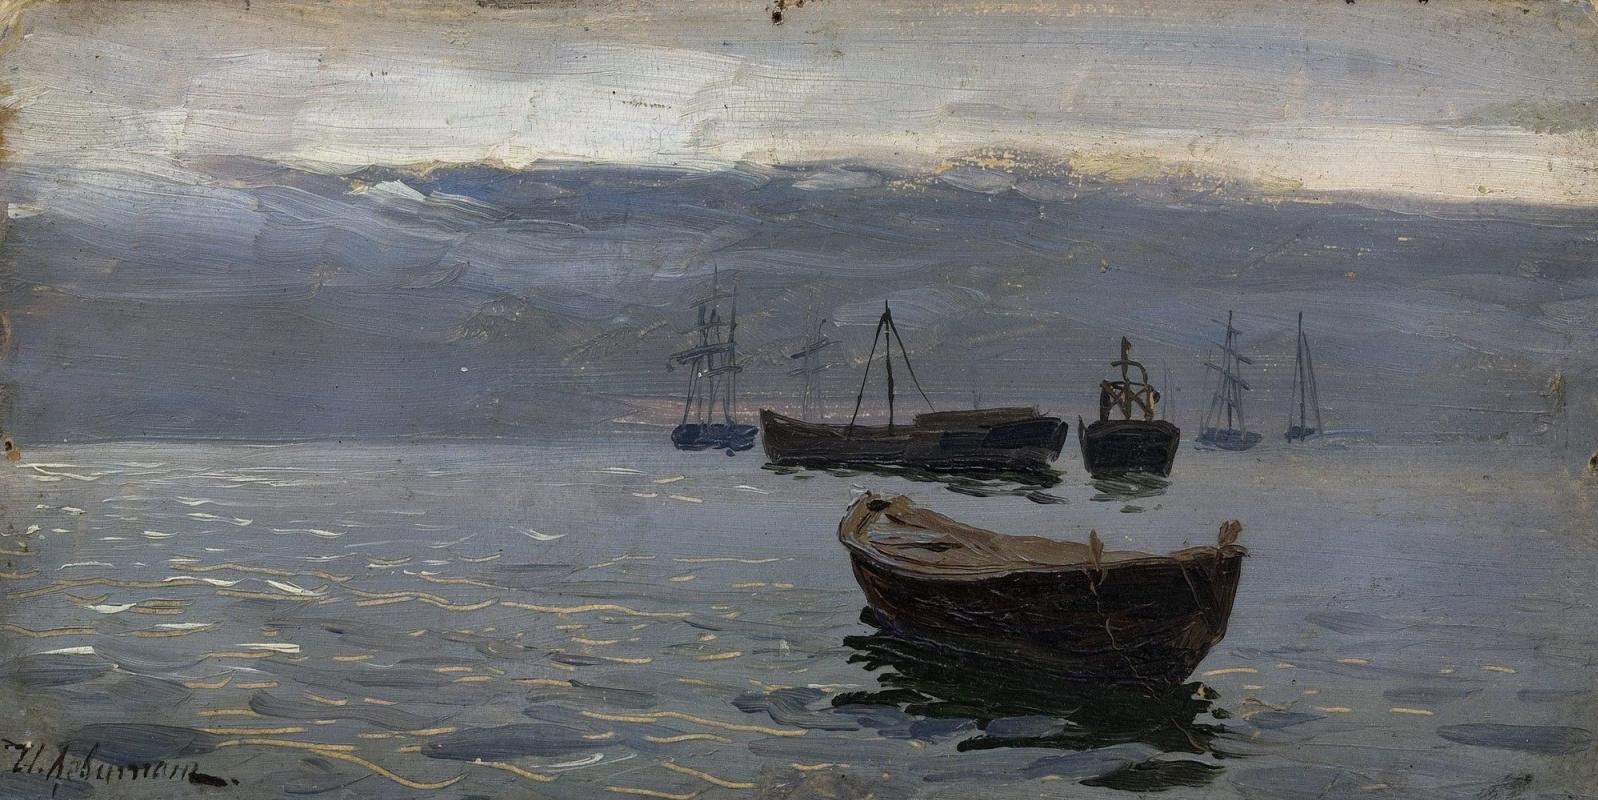 Isaac Levitan. On The Volga River. The evening